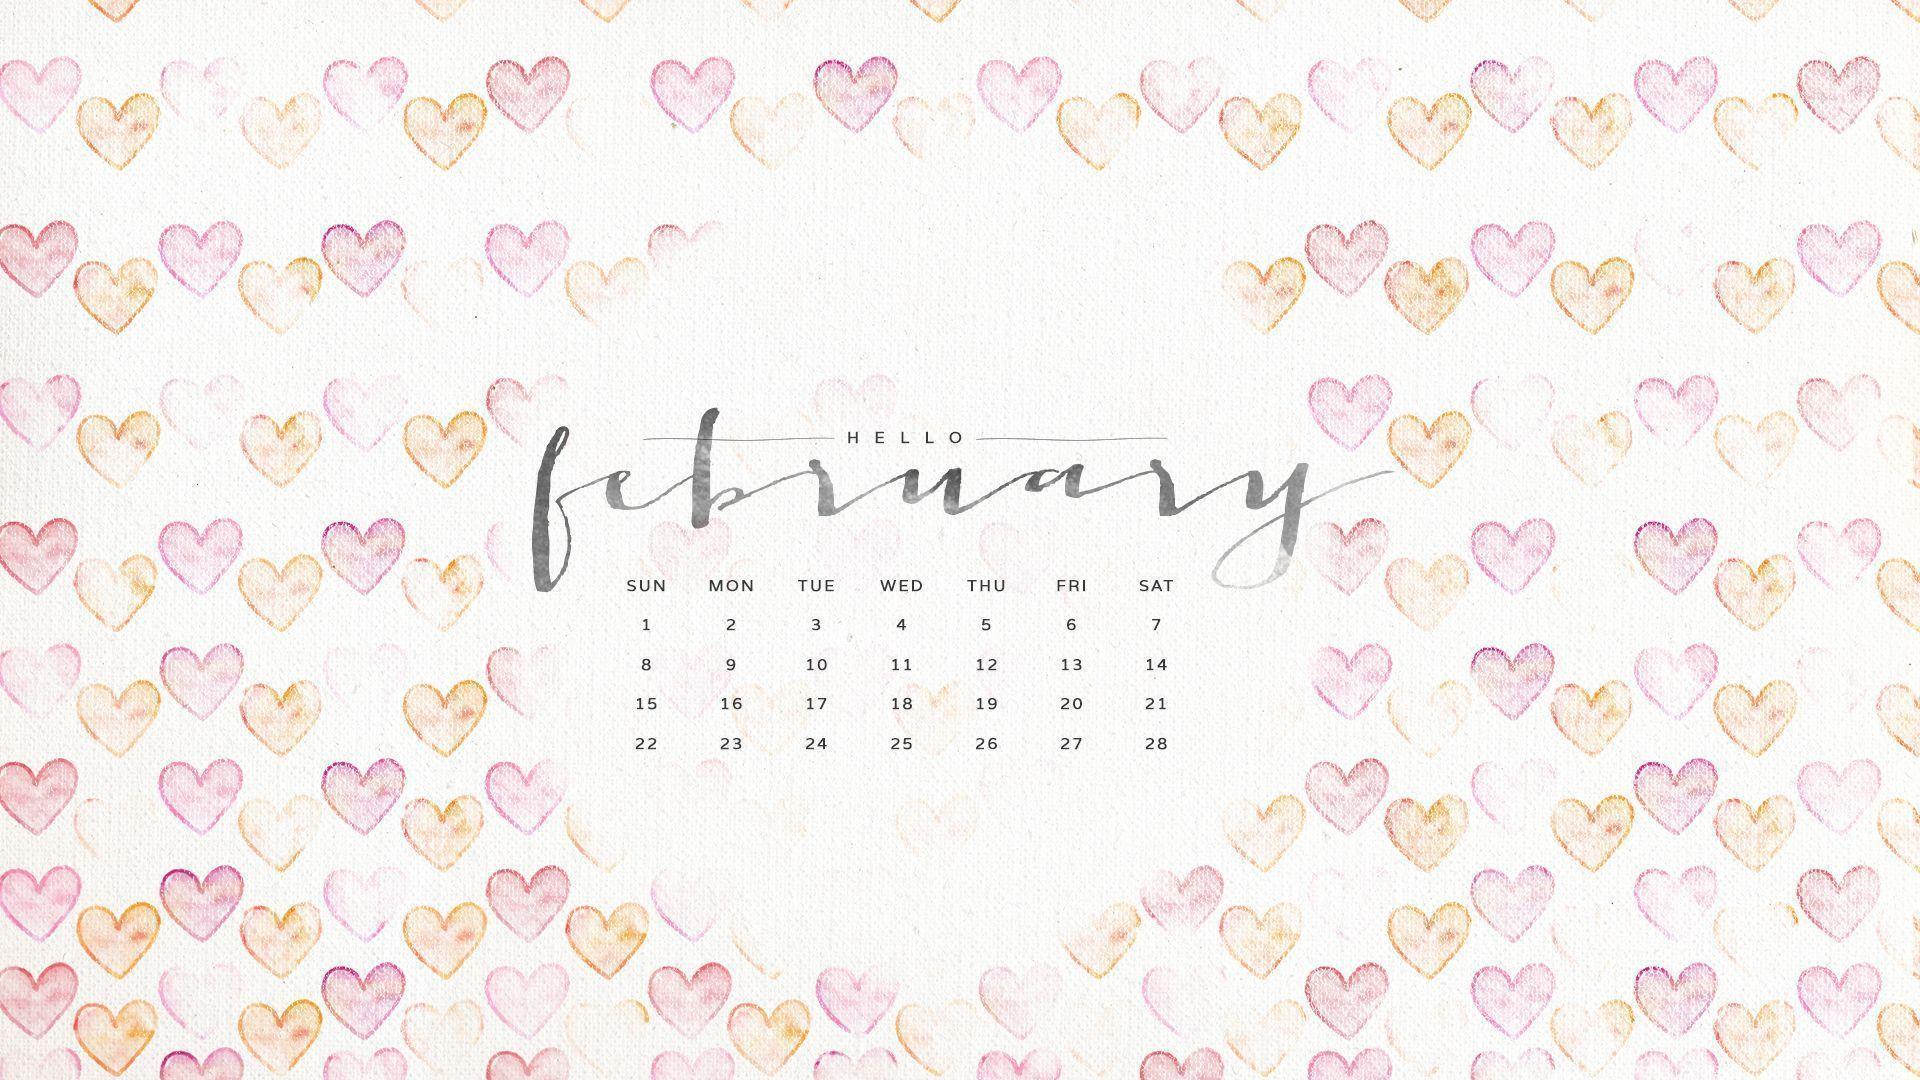 Desktop Wallpapers Calendar January 2017 1920x1080